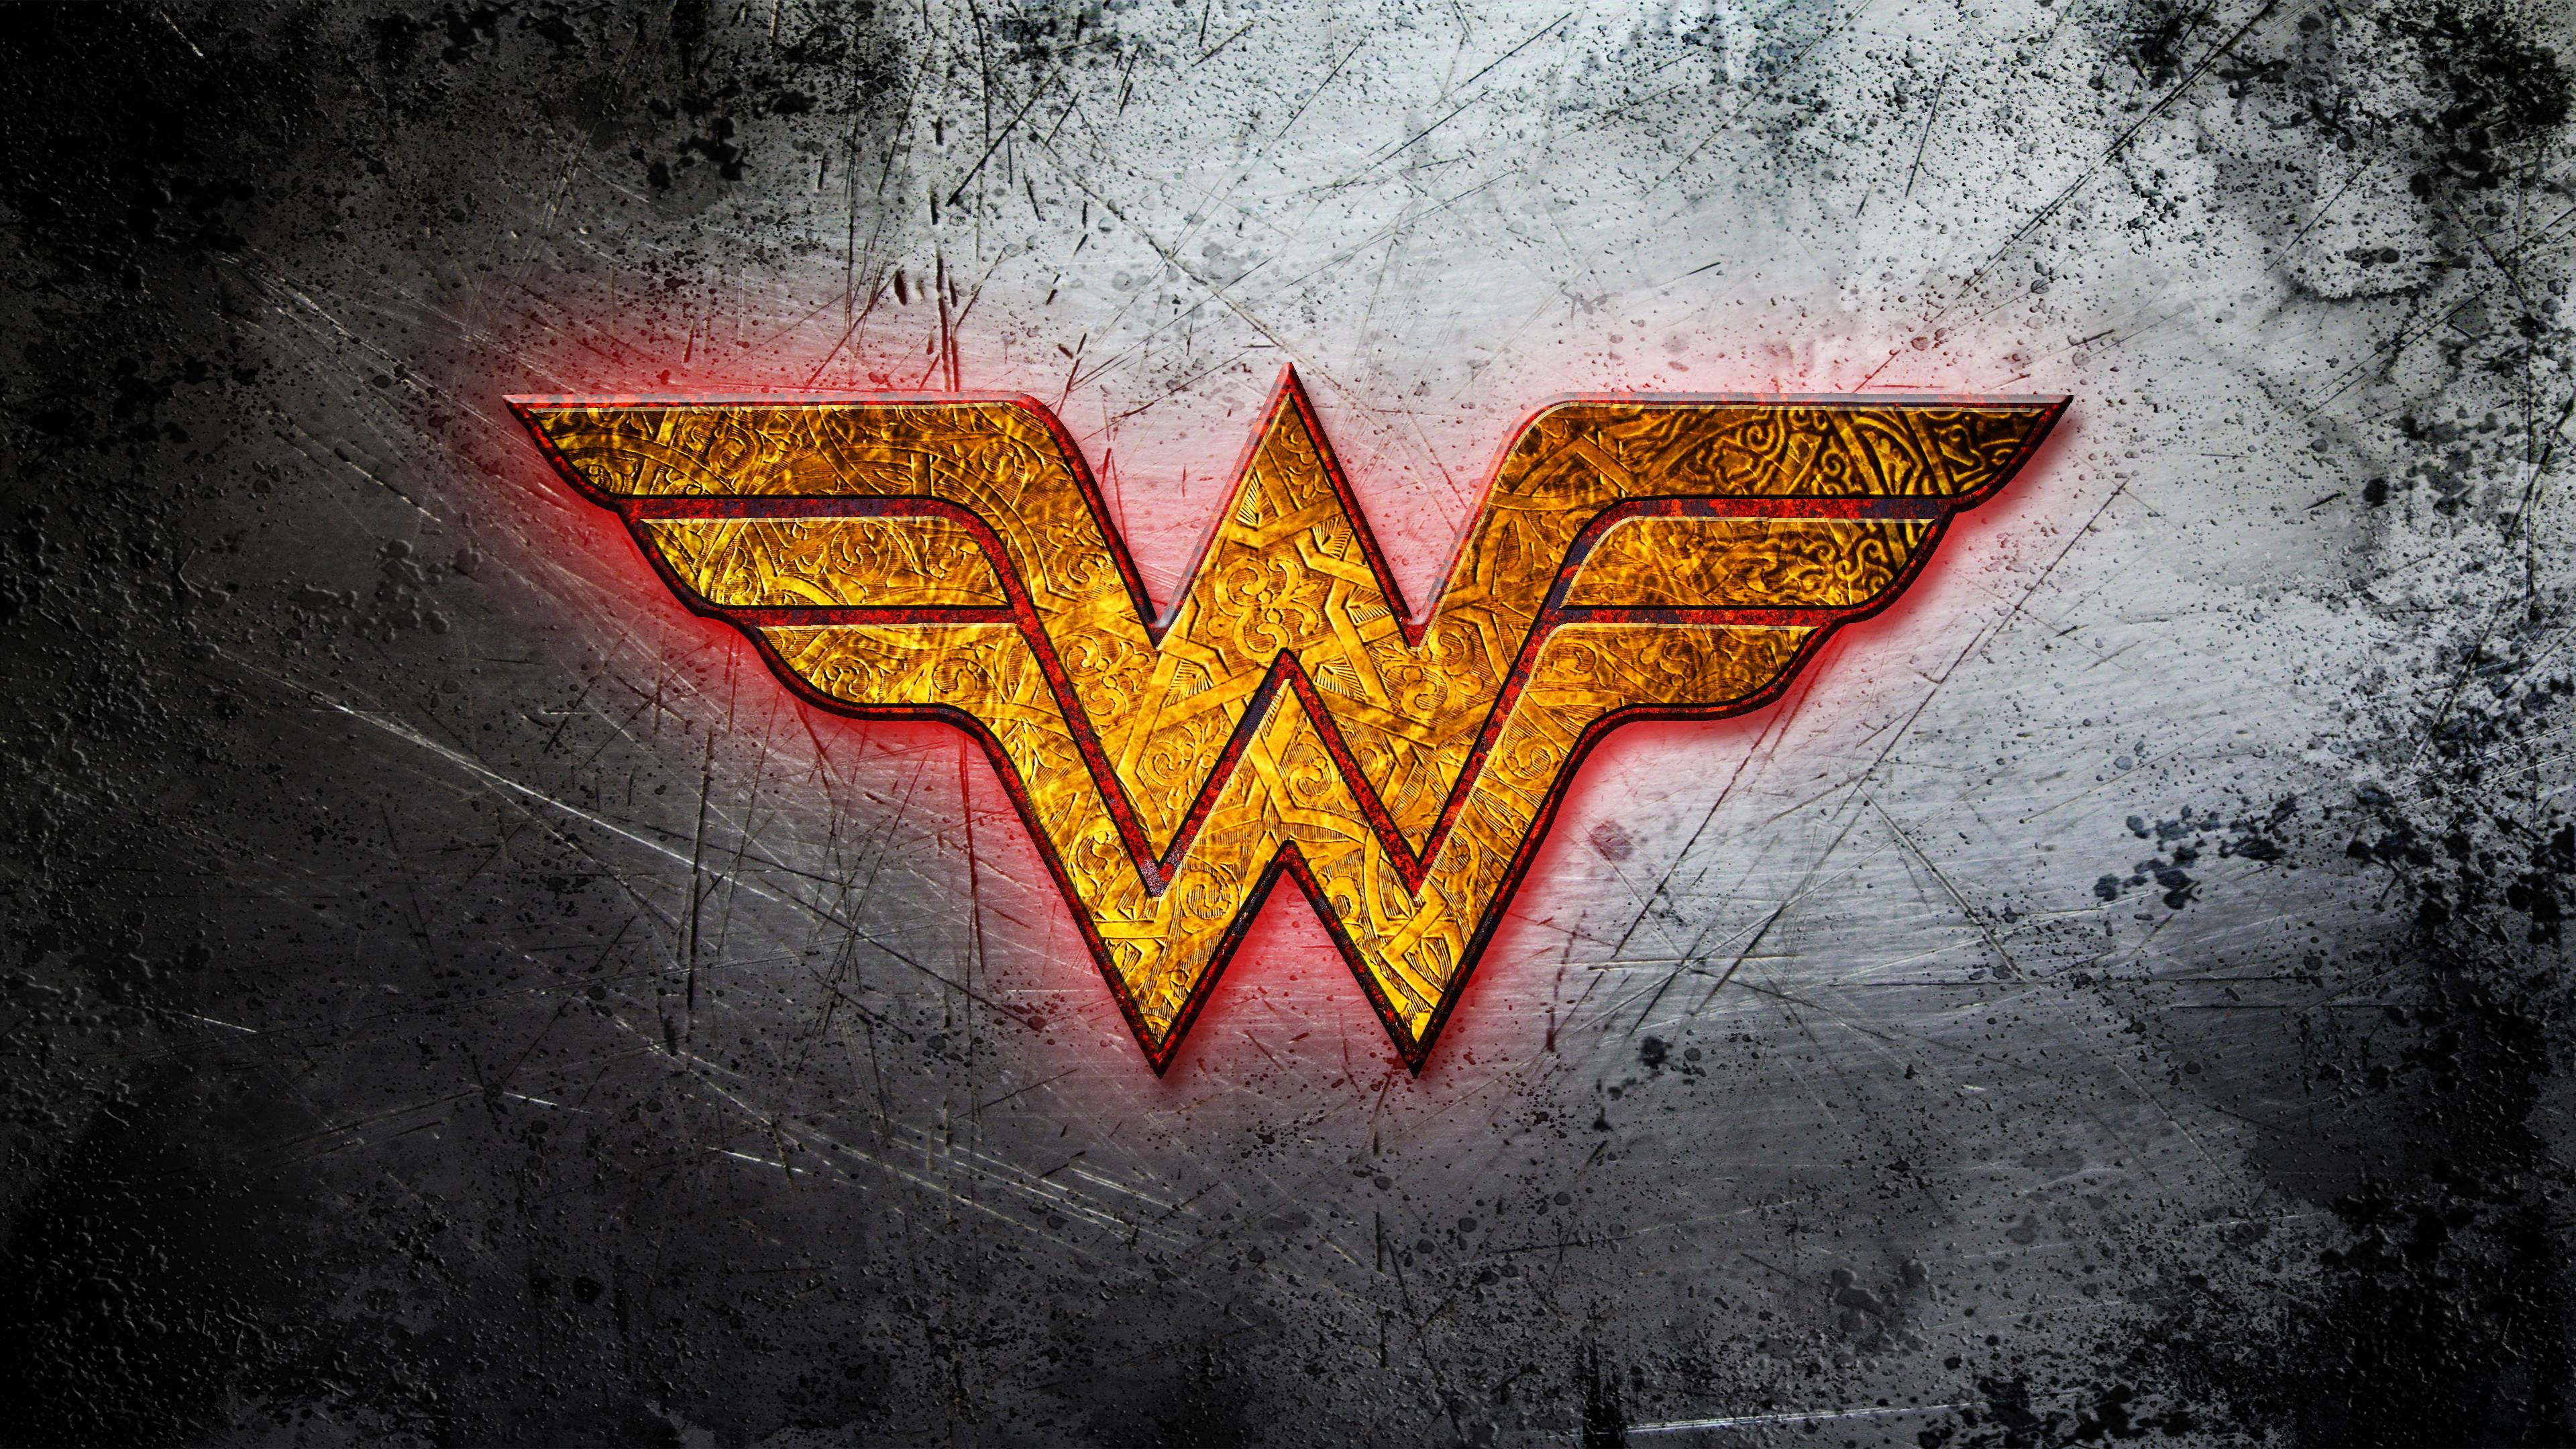 Hd wallpaper wonder woman - Wonder Woman Logo Wallpaper Wallpapersafari